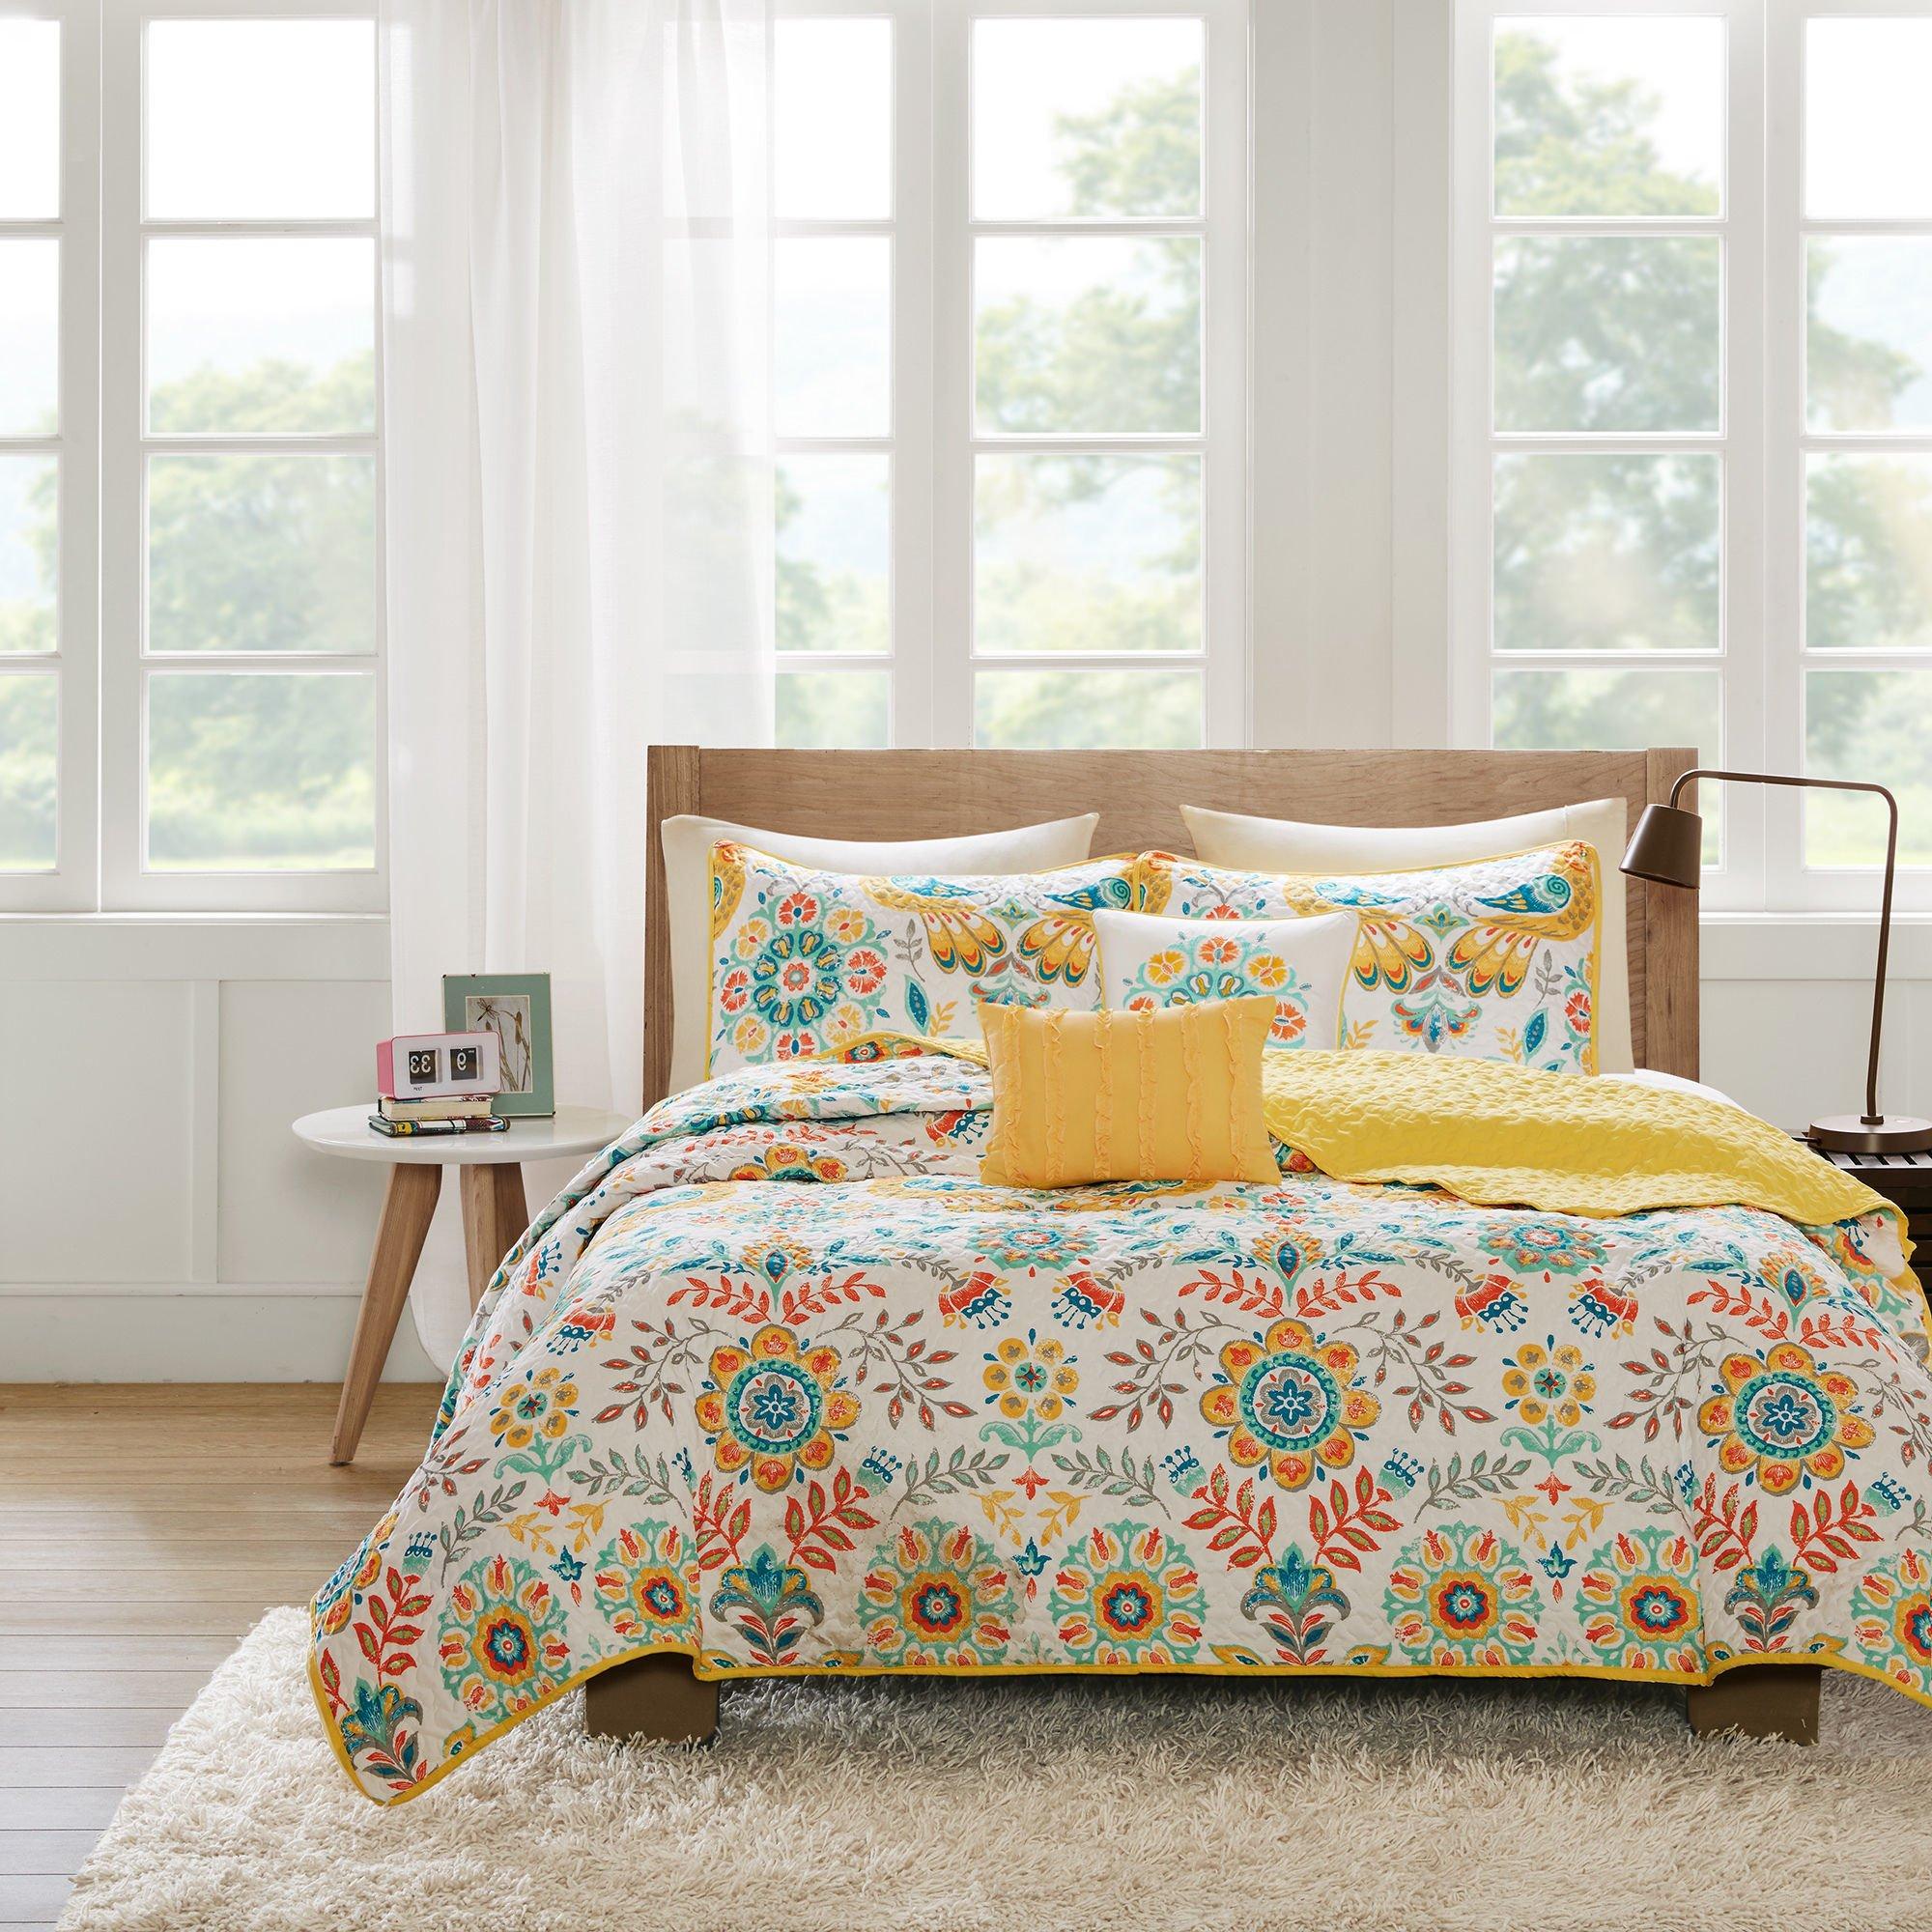 Multicolor teen quilt bedding